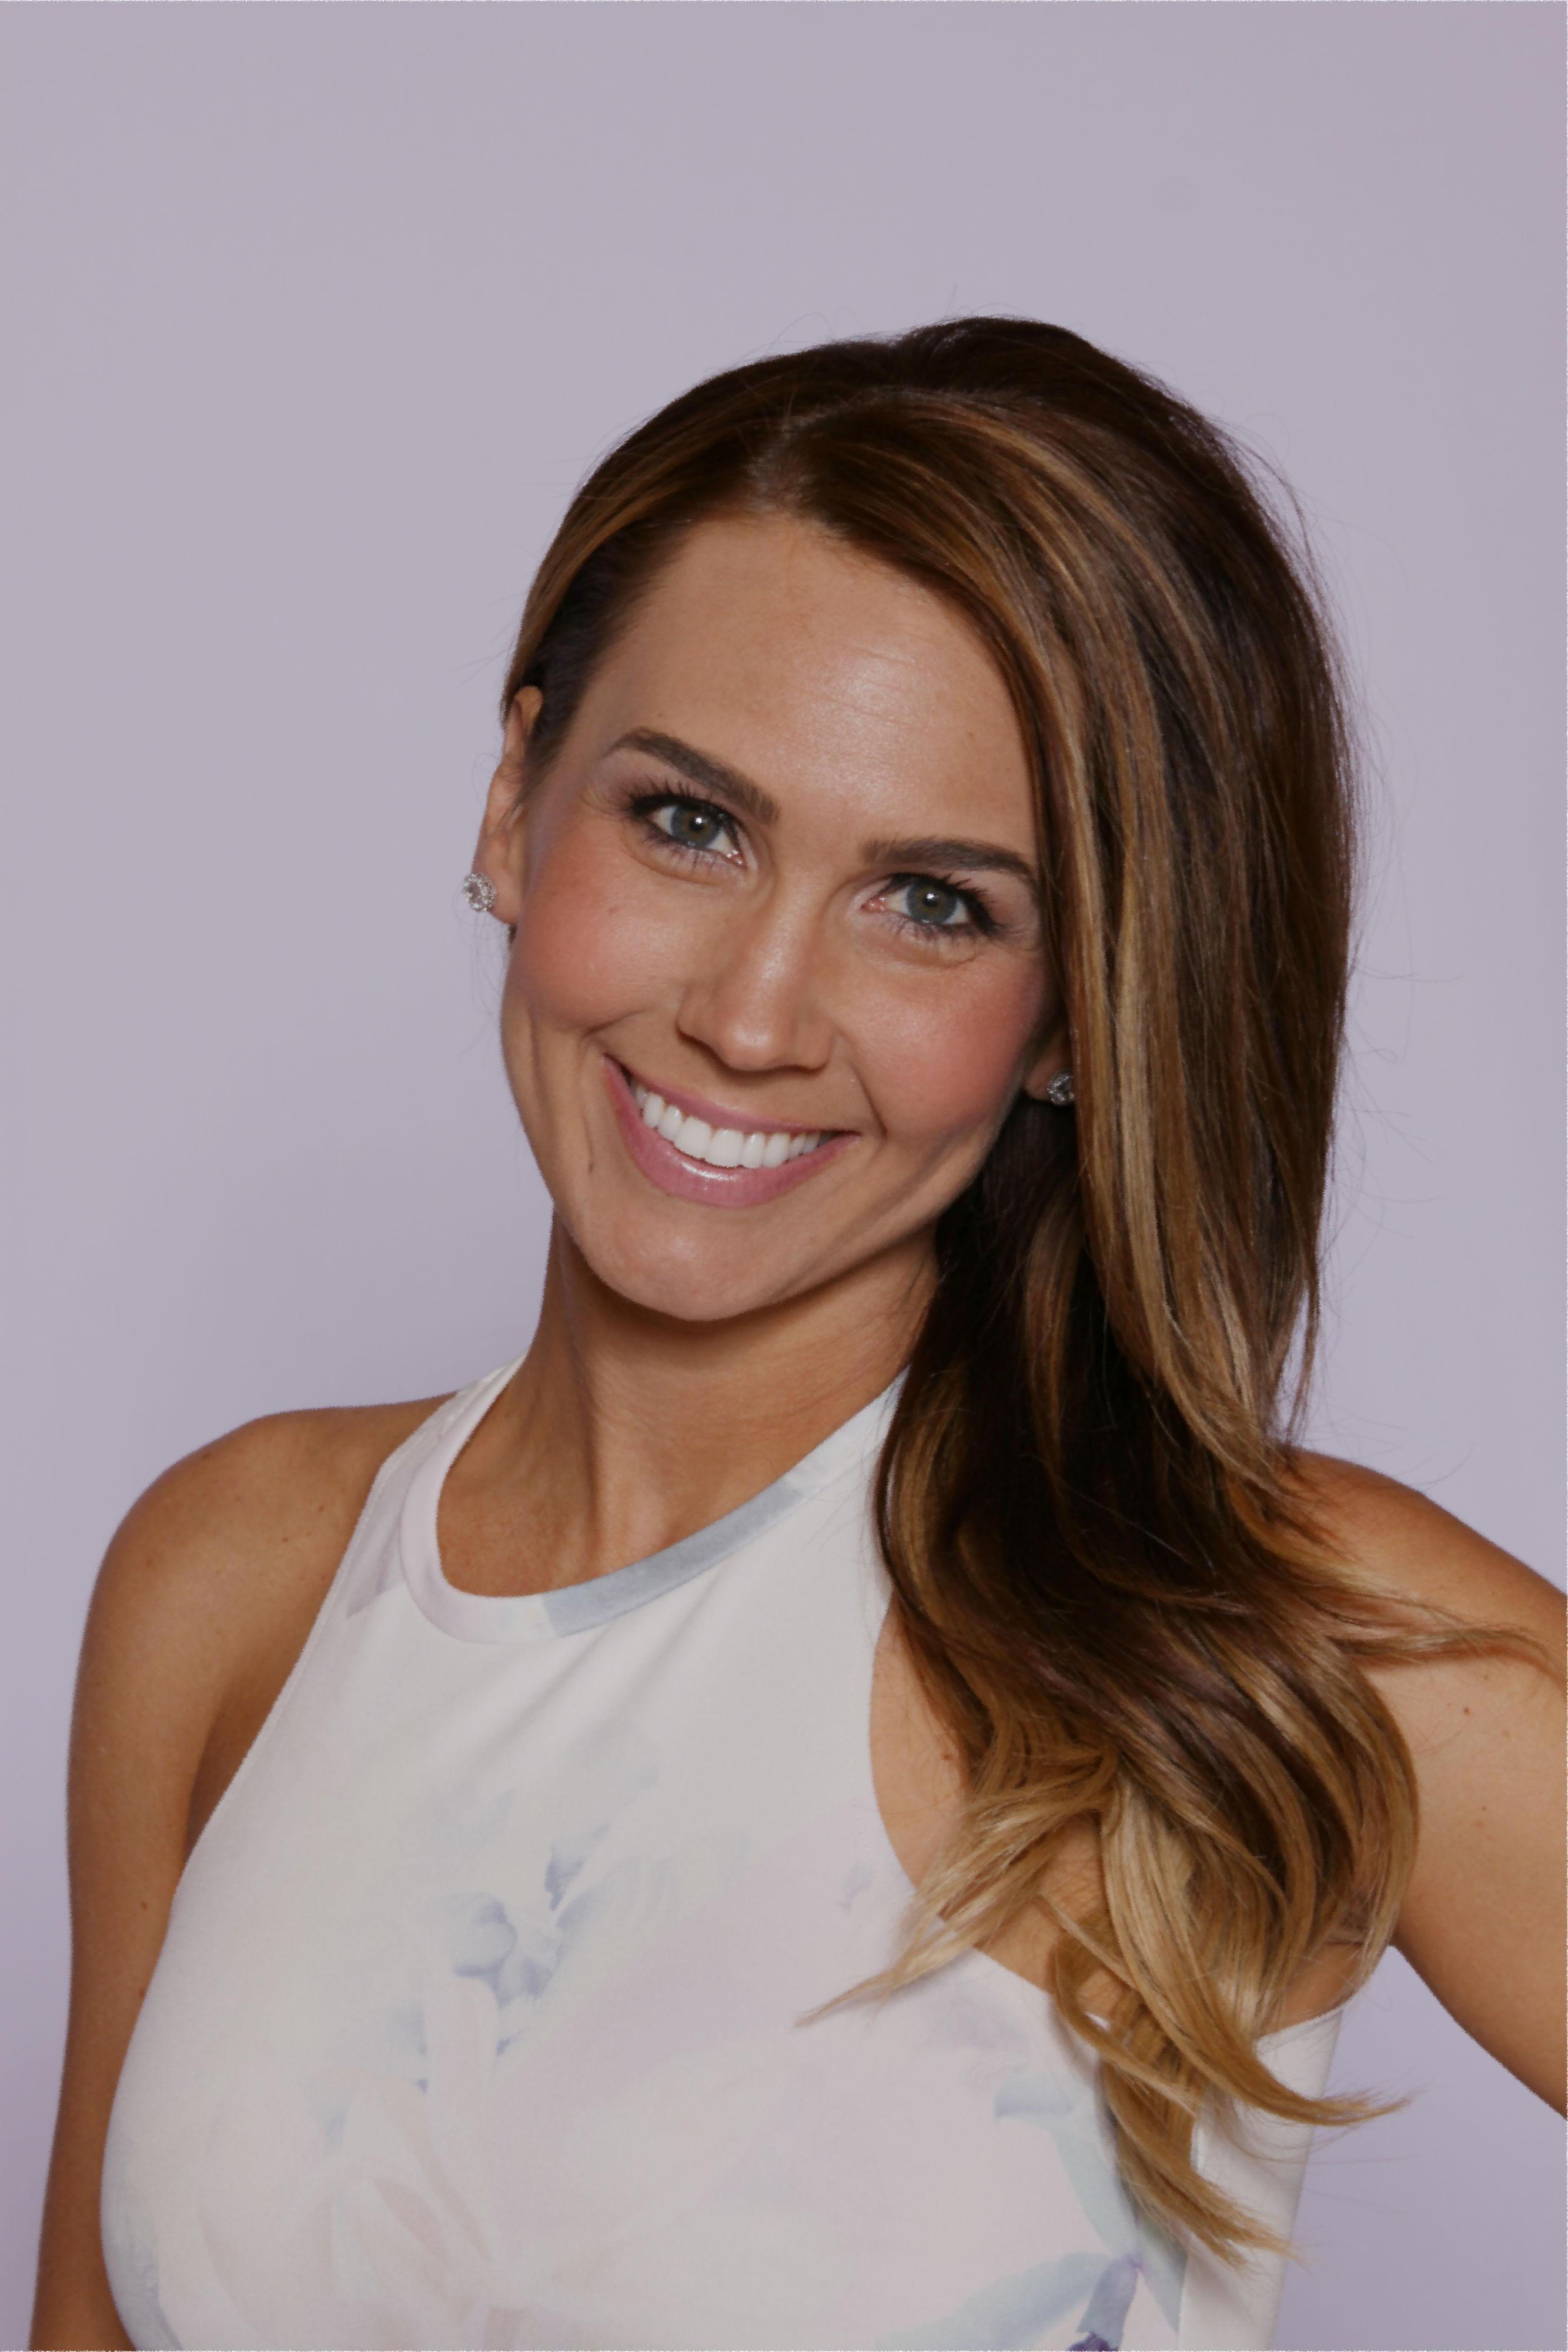 DanielleBald